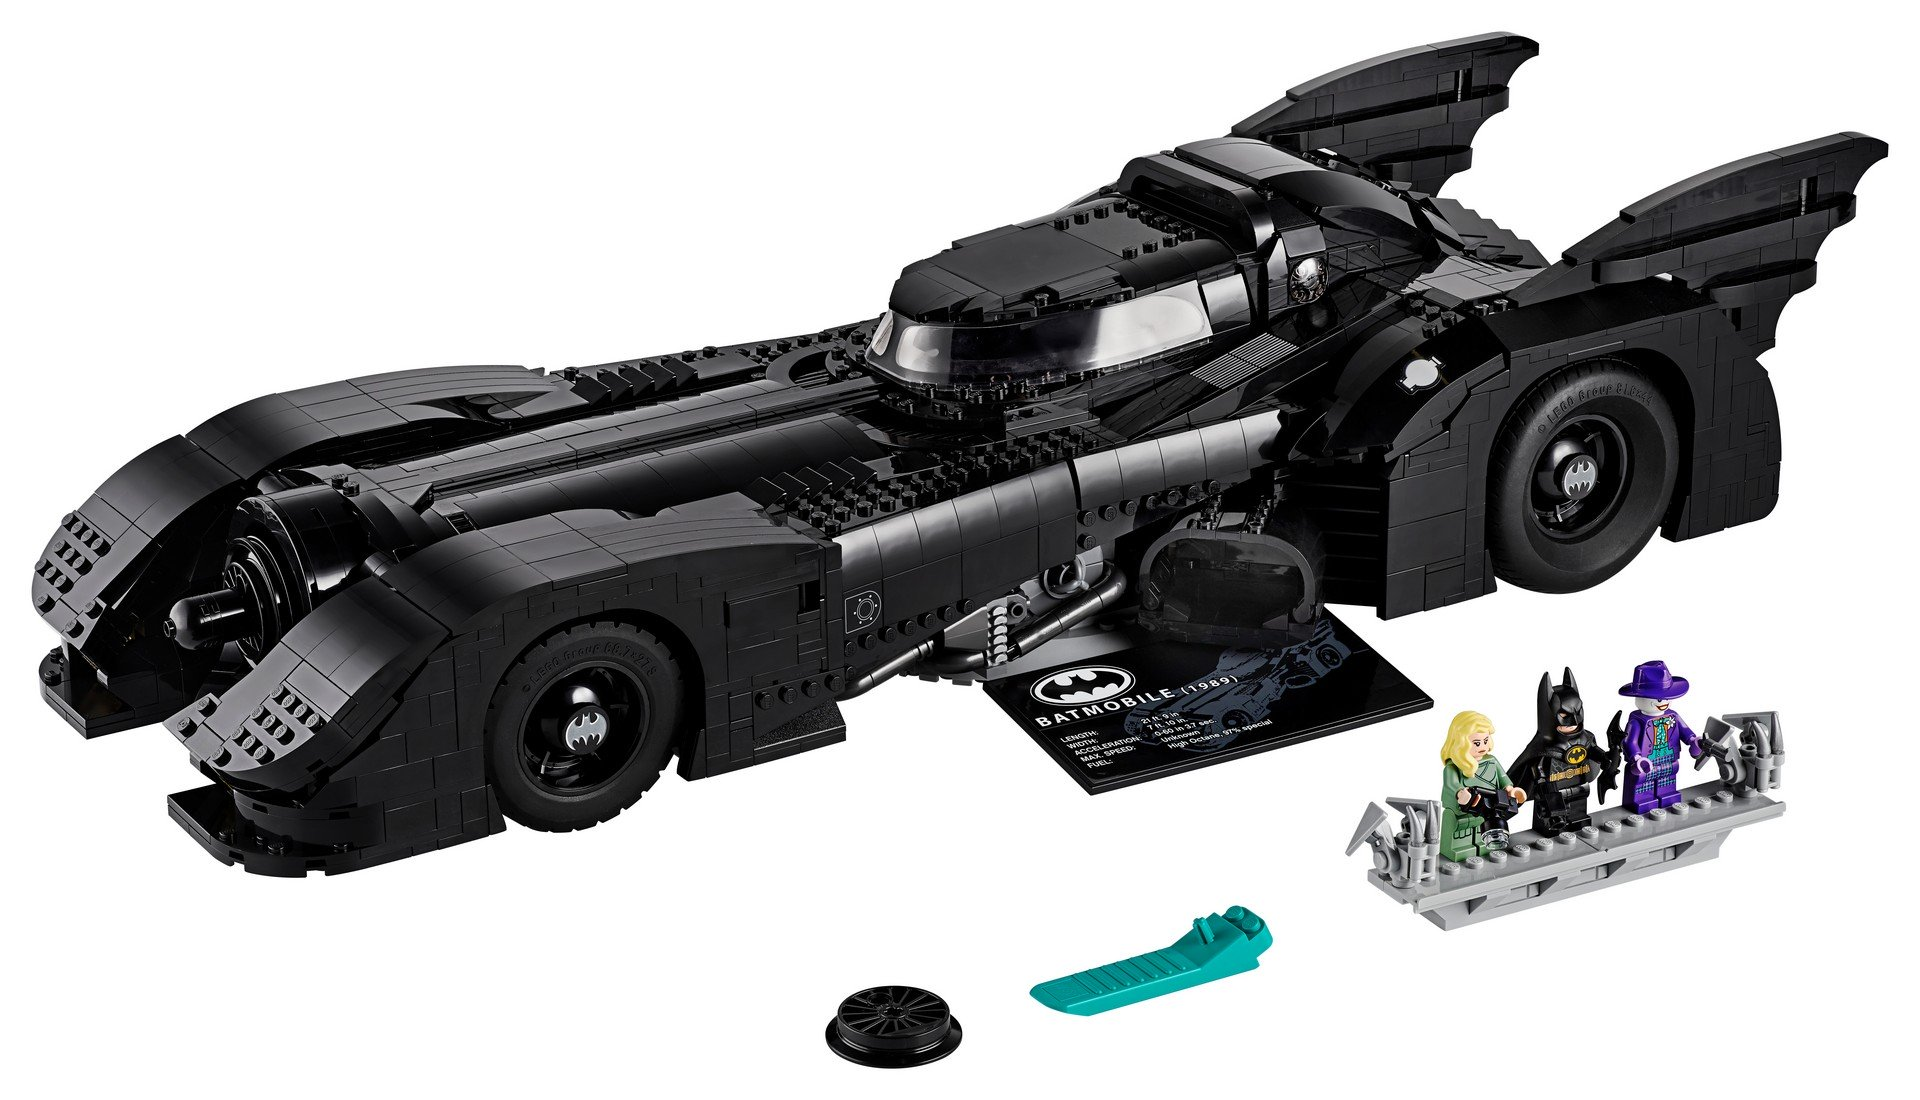 Lego-Batmobile-kit-1989-2